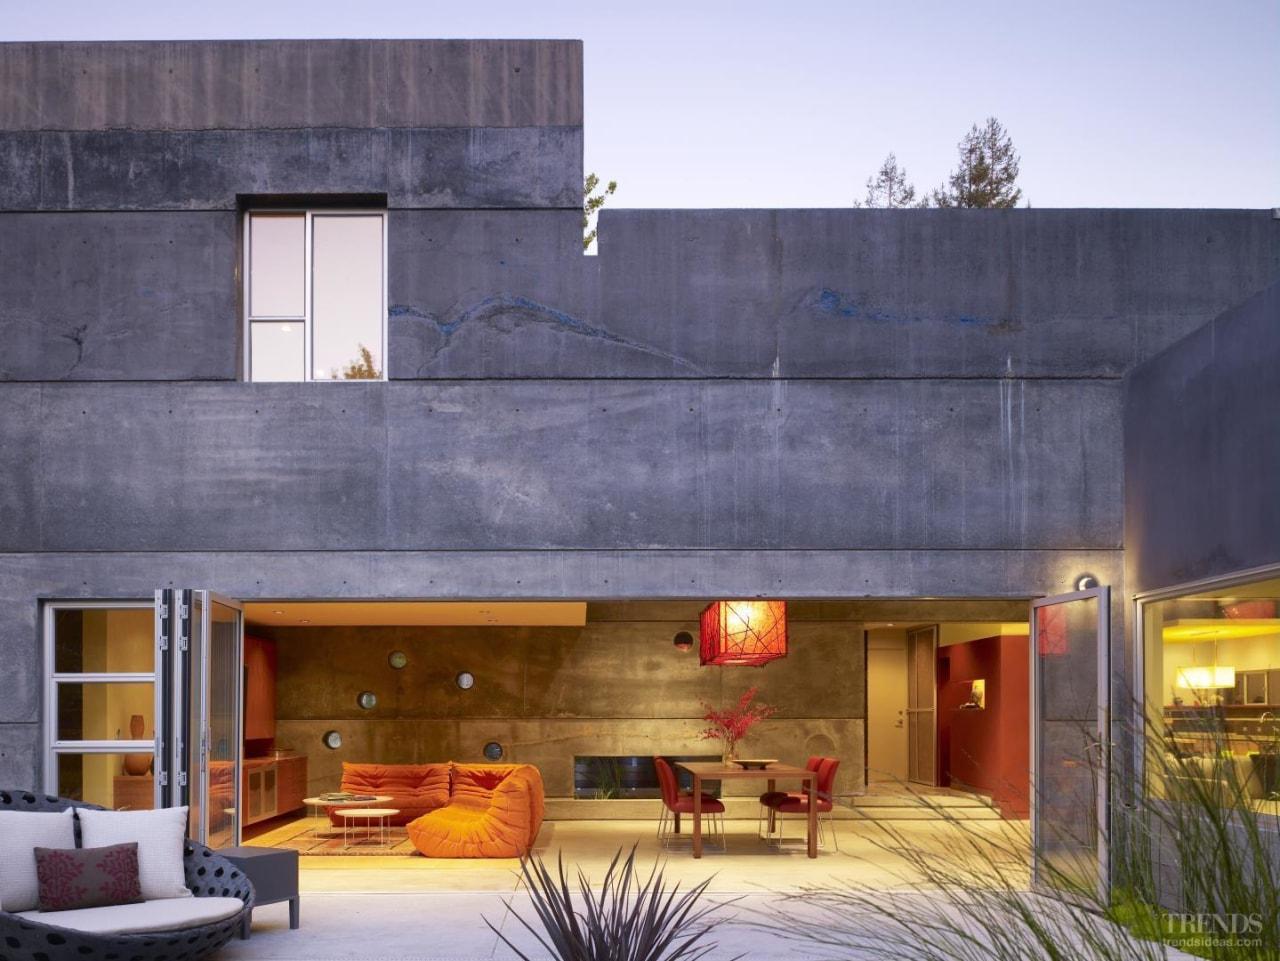 Commanding perspective - architecture | building | estate architecture, building, estate, facade, home, house, interior design, property, real estate, purple